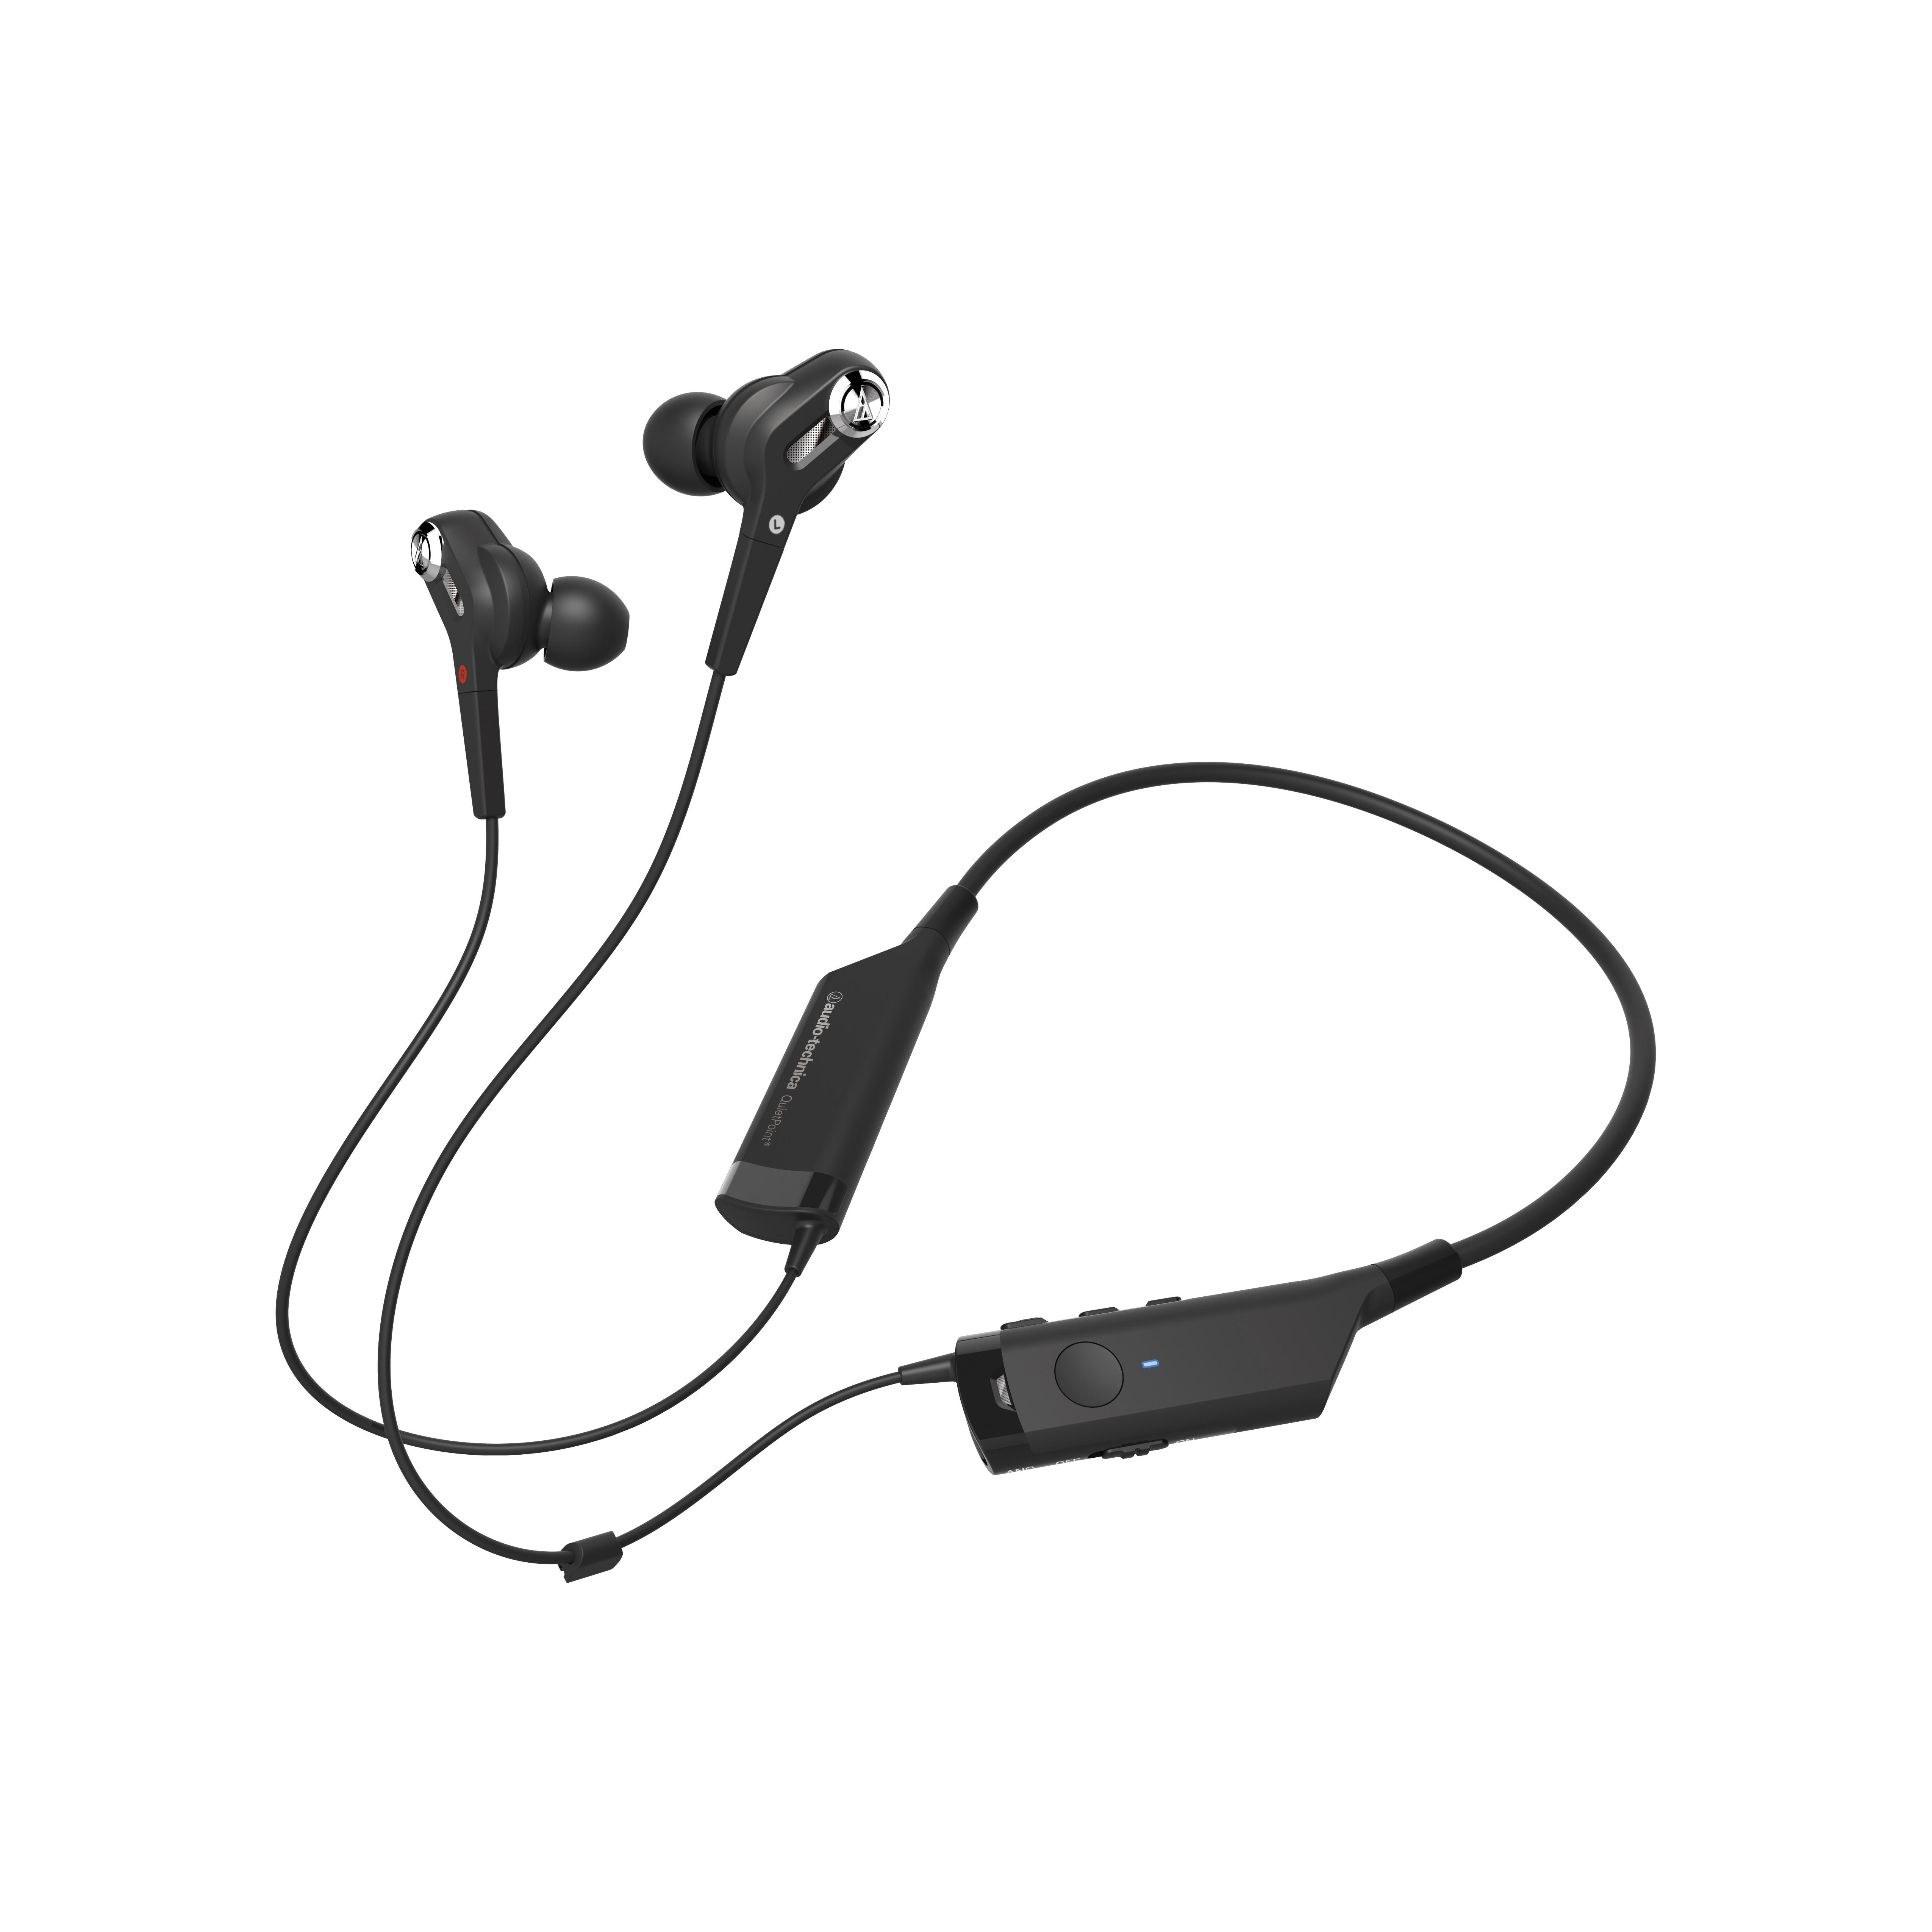 Audio-Technica ATH-ANC40 BT Black